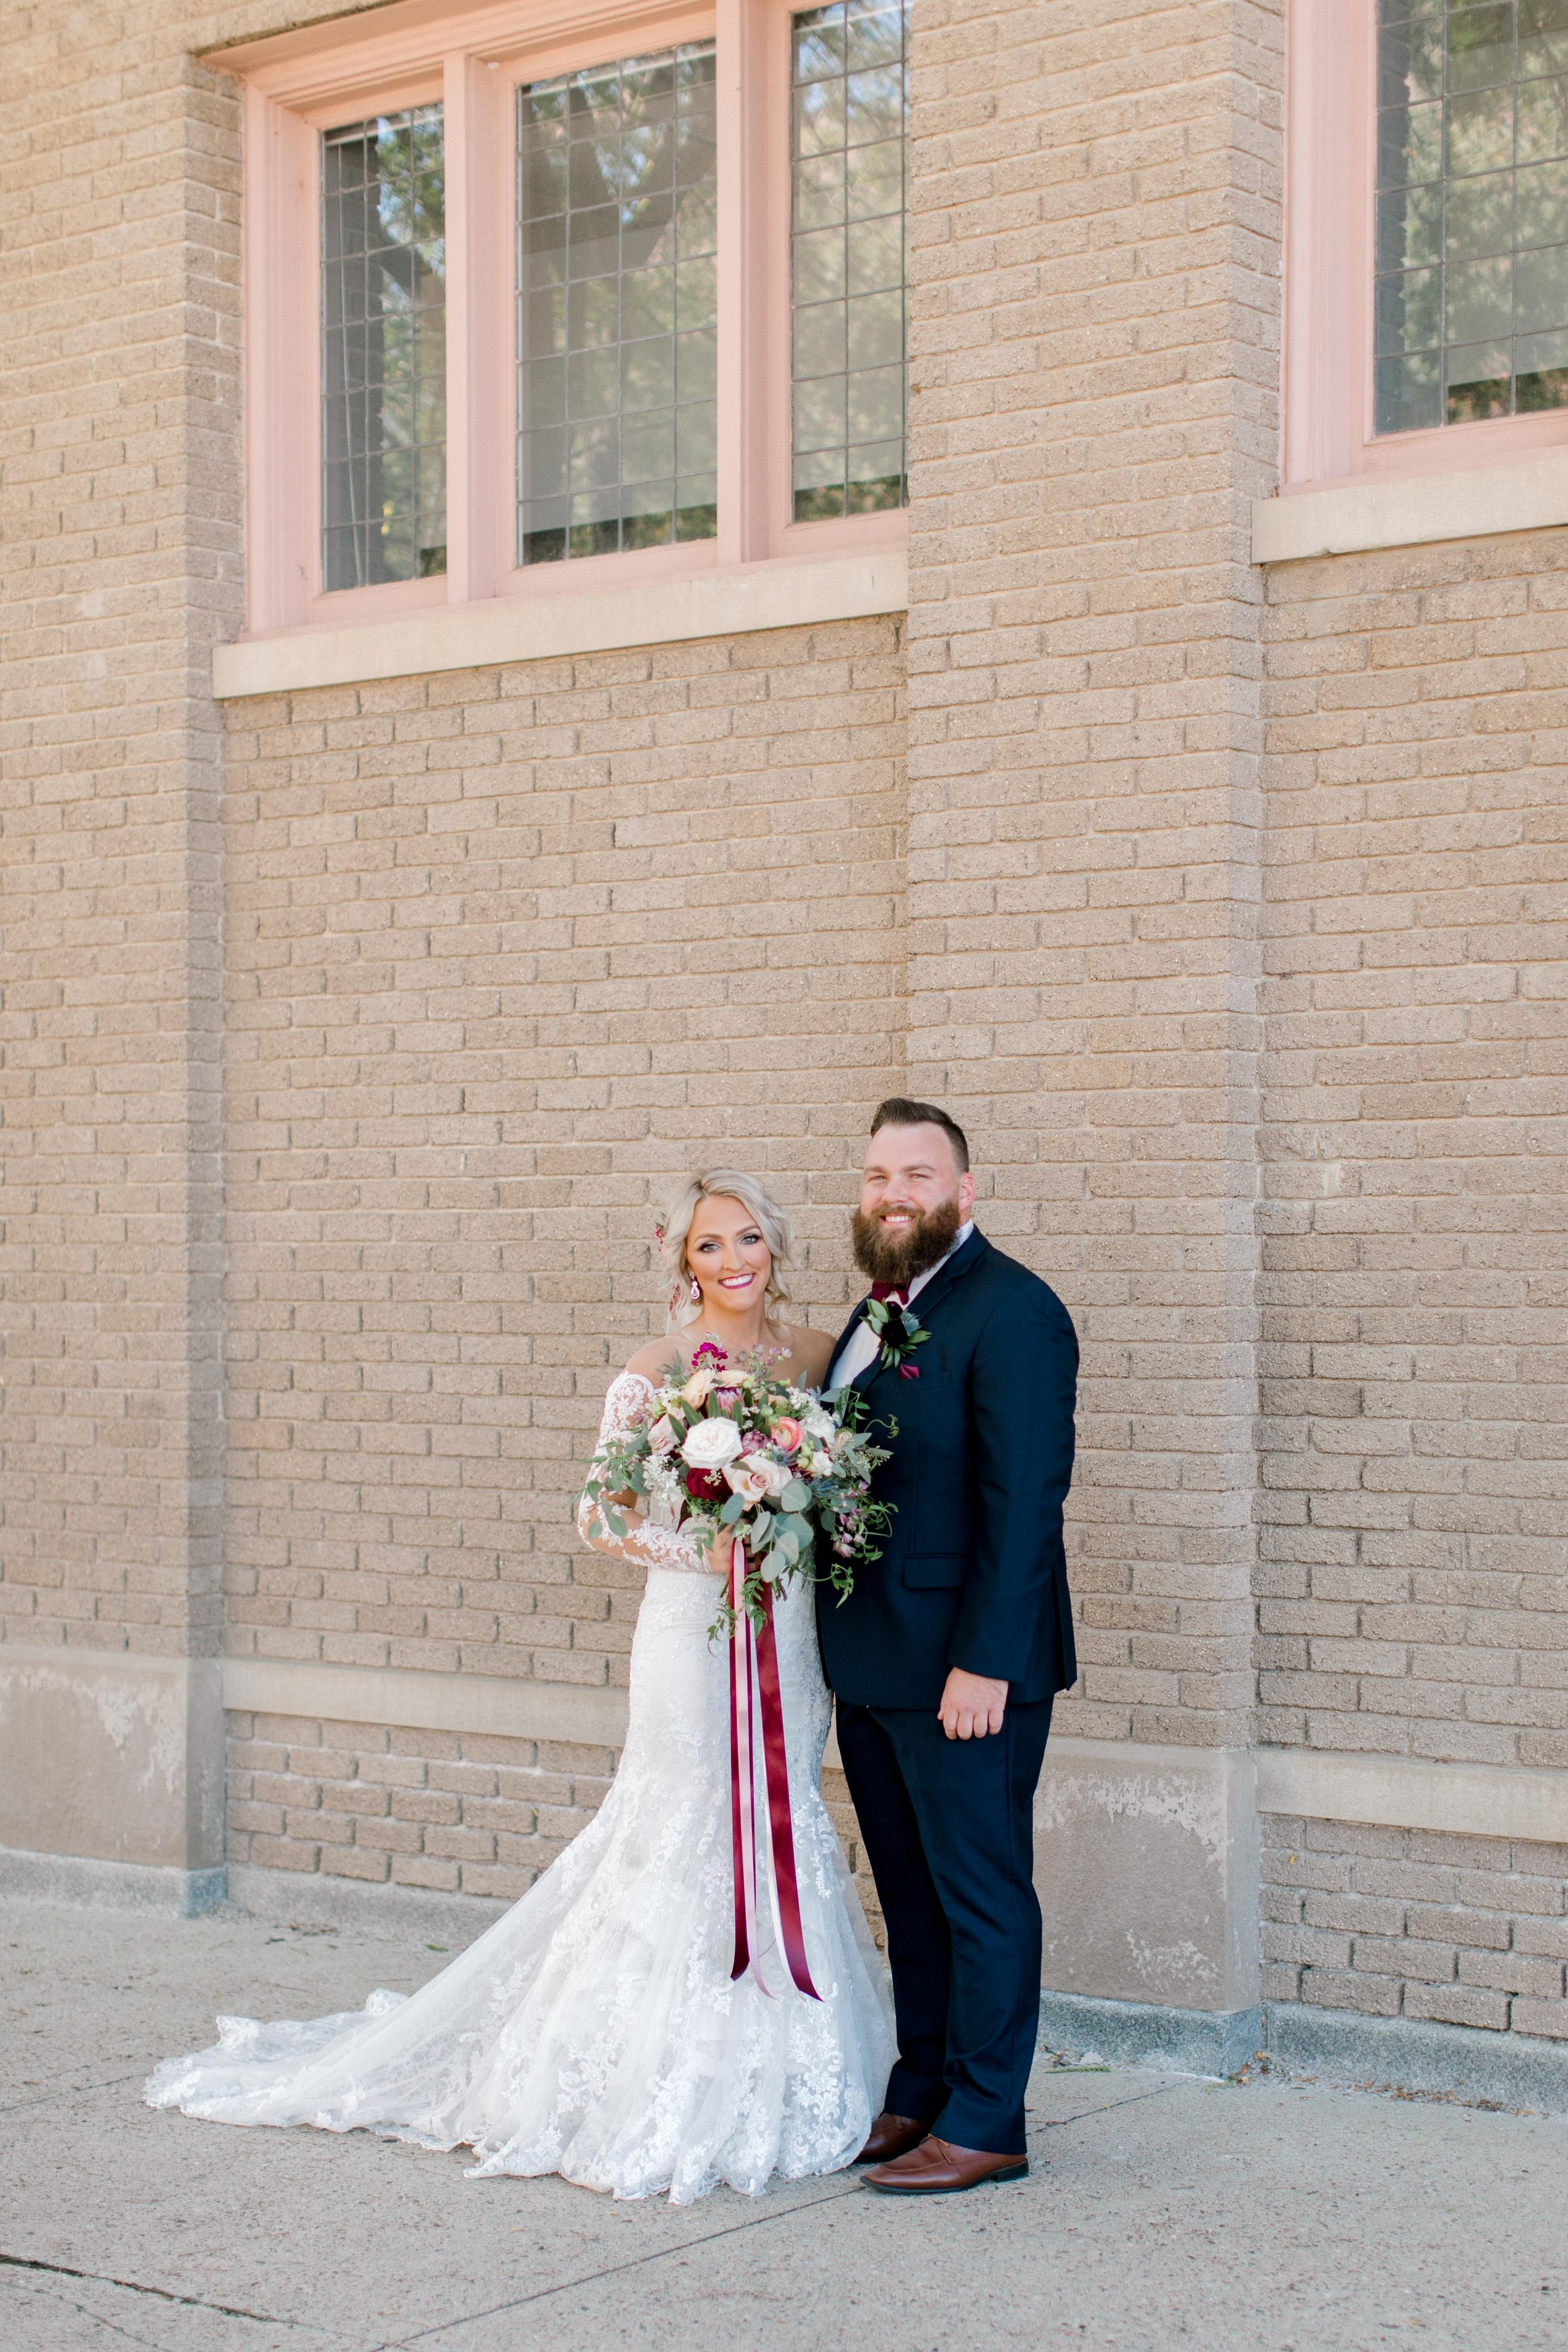 Ryan Alexa Married-Portraits-0005.jpg